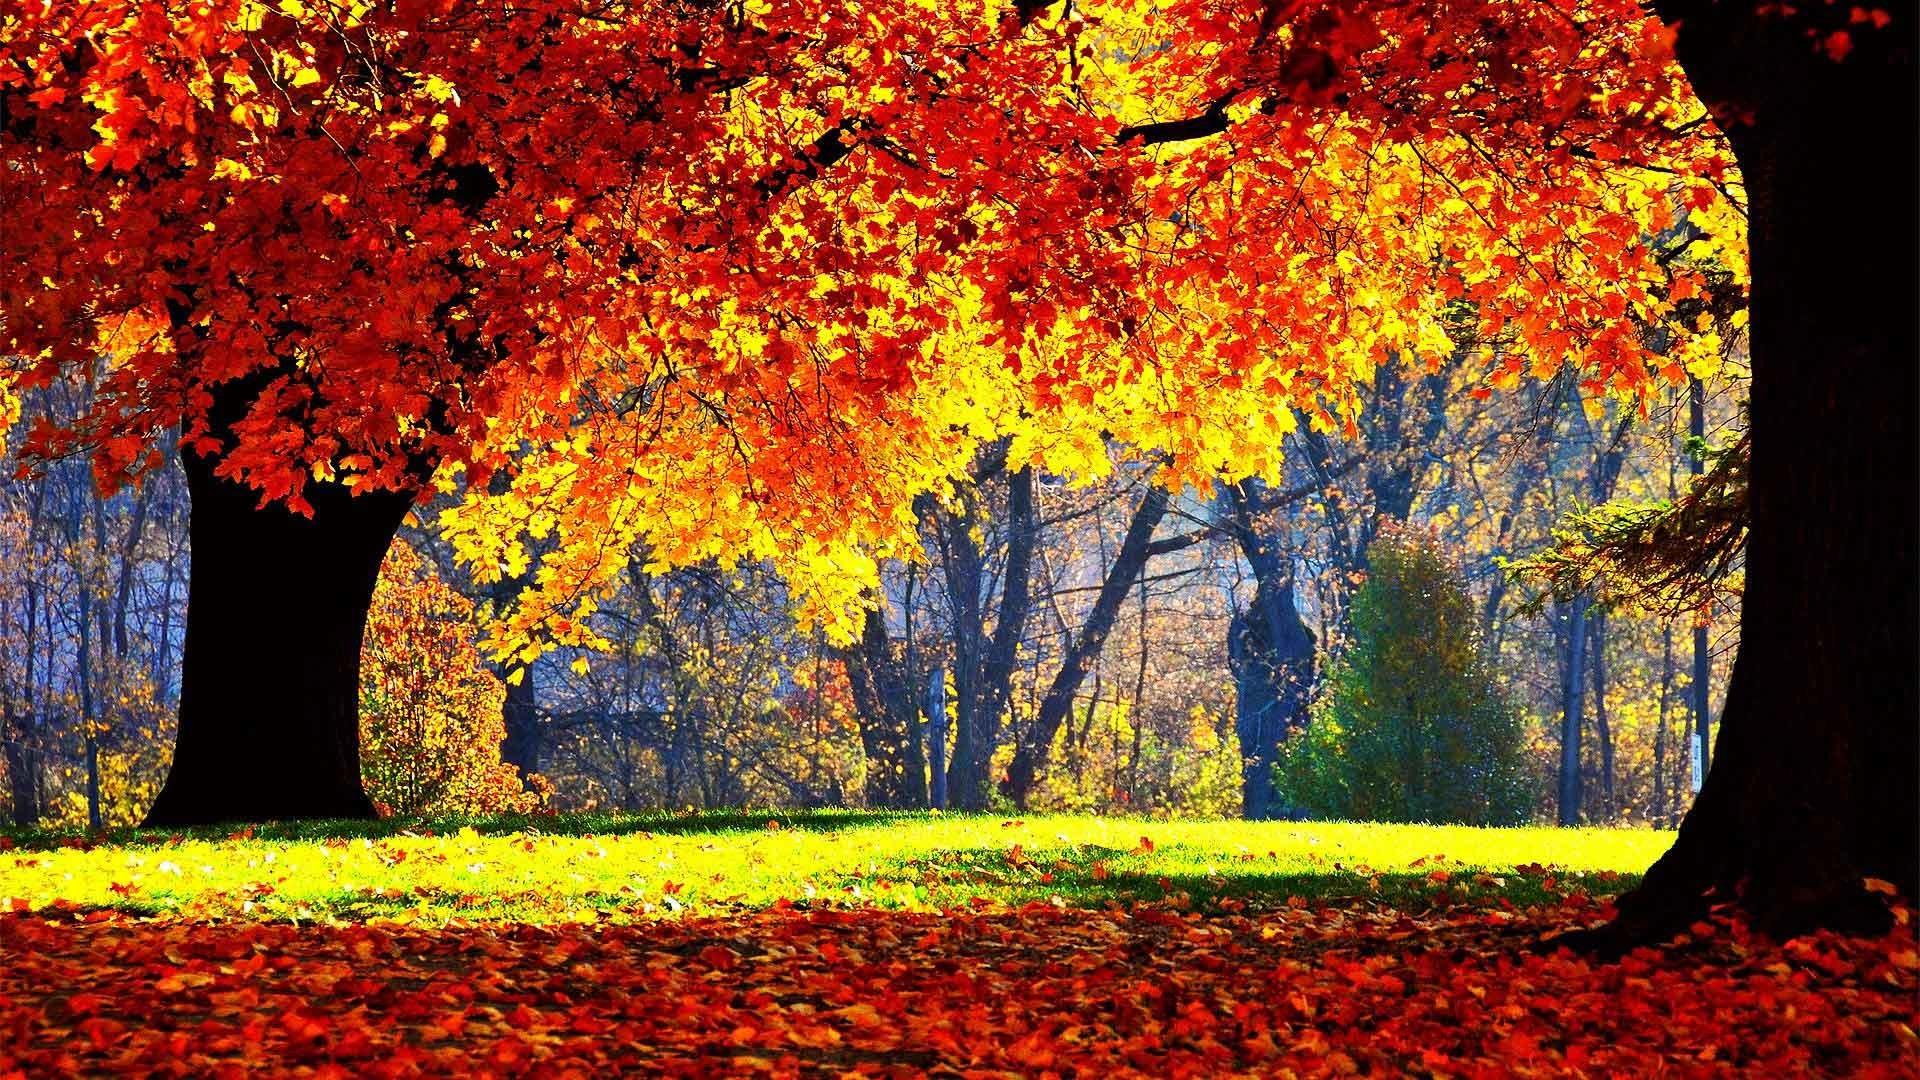 Autumn Leaves 3d Live Wallpaper Wallpaper Fall Season 183 ①